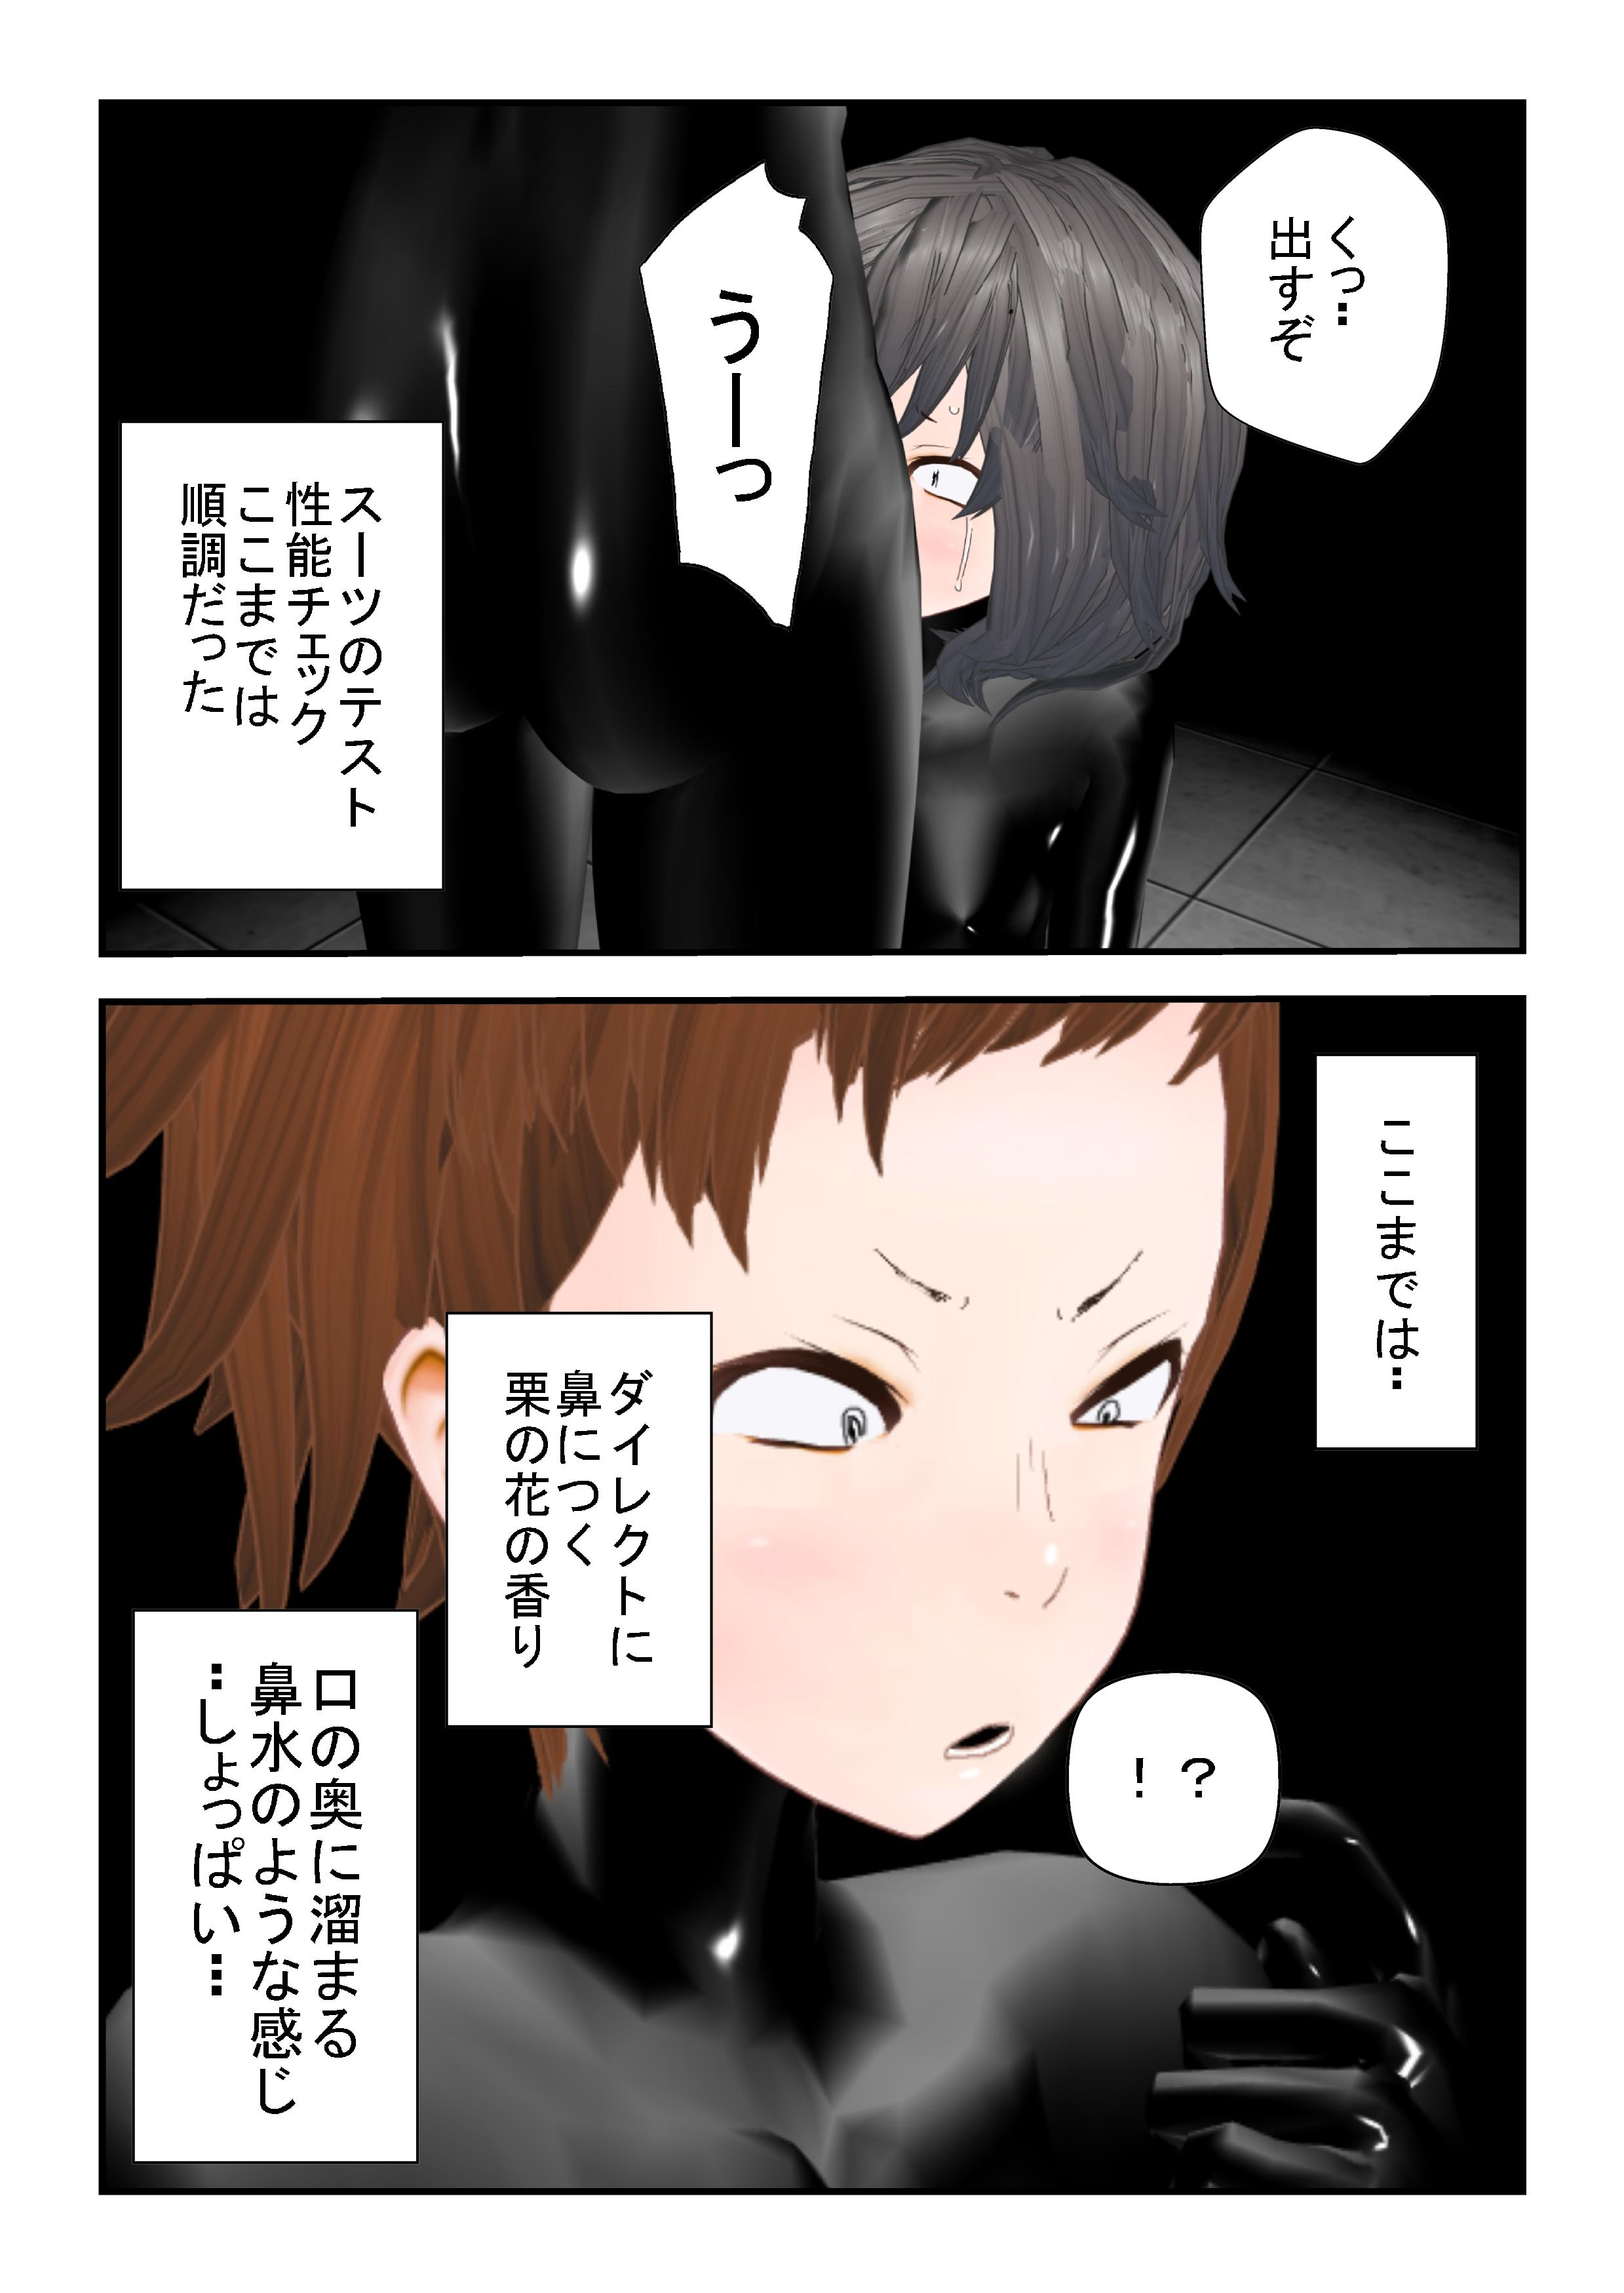 shi_0008.jpg